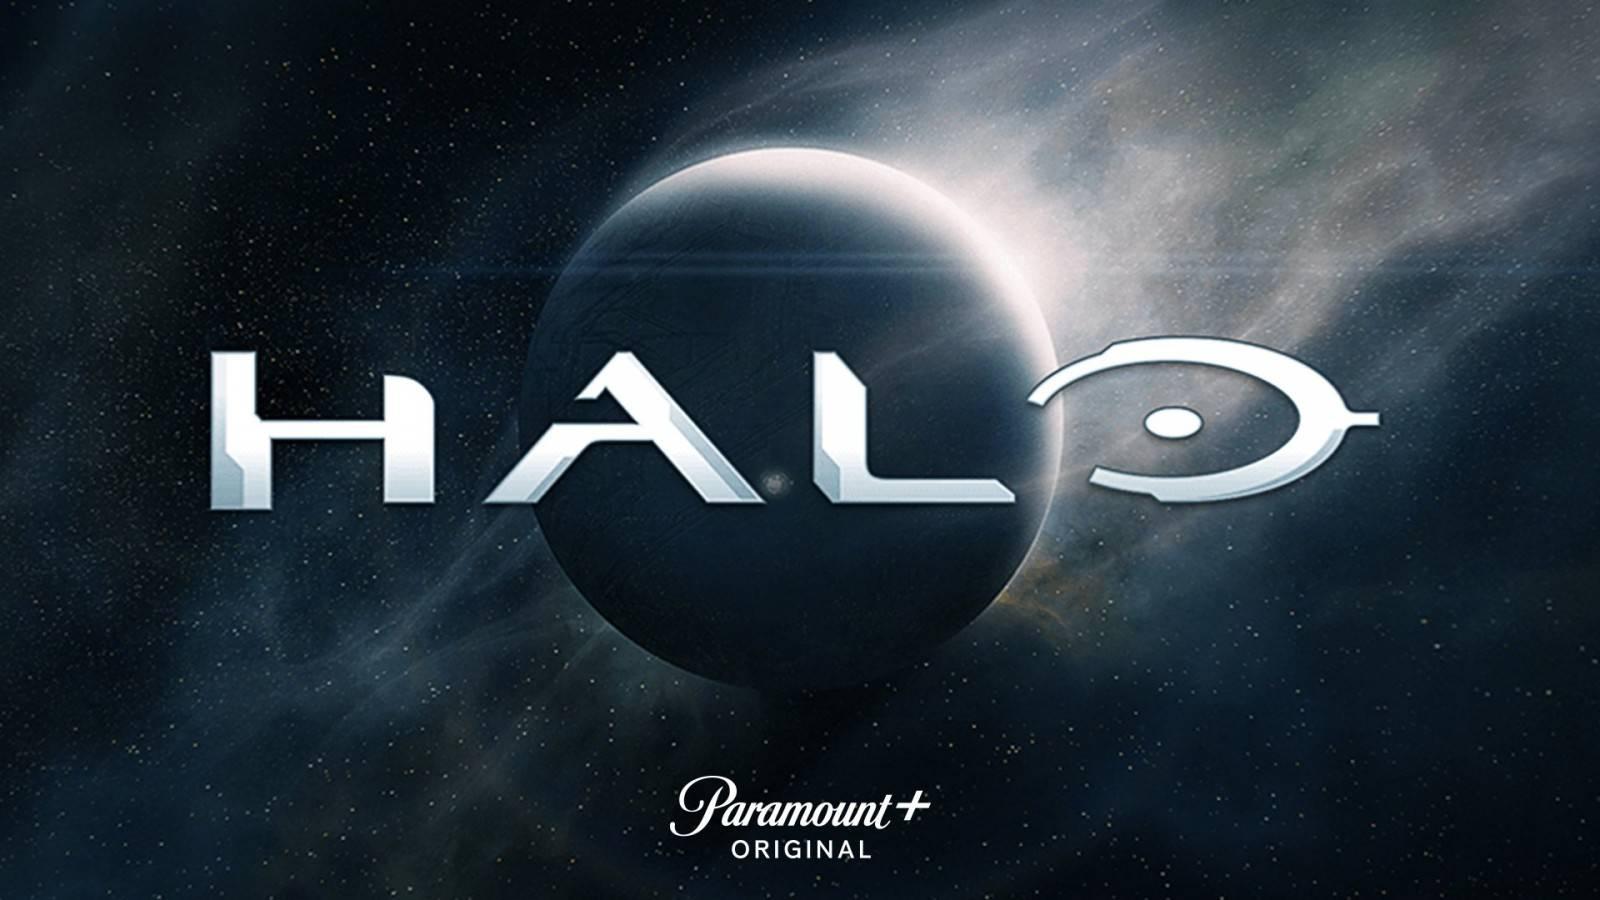 Halo Paramount